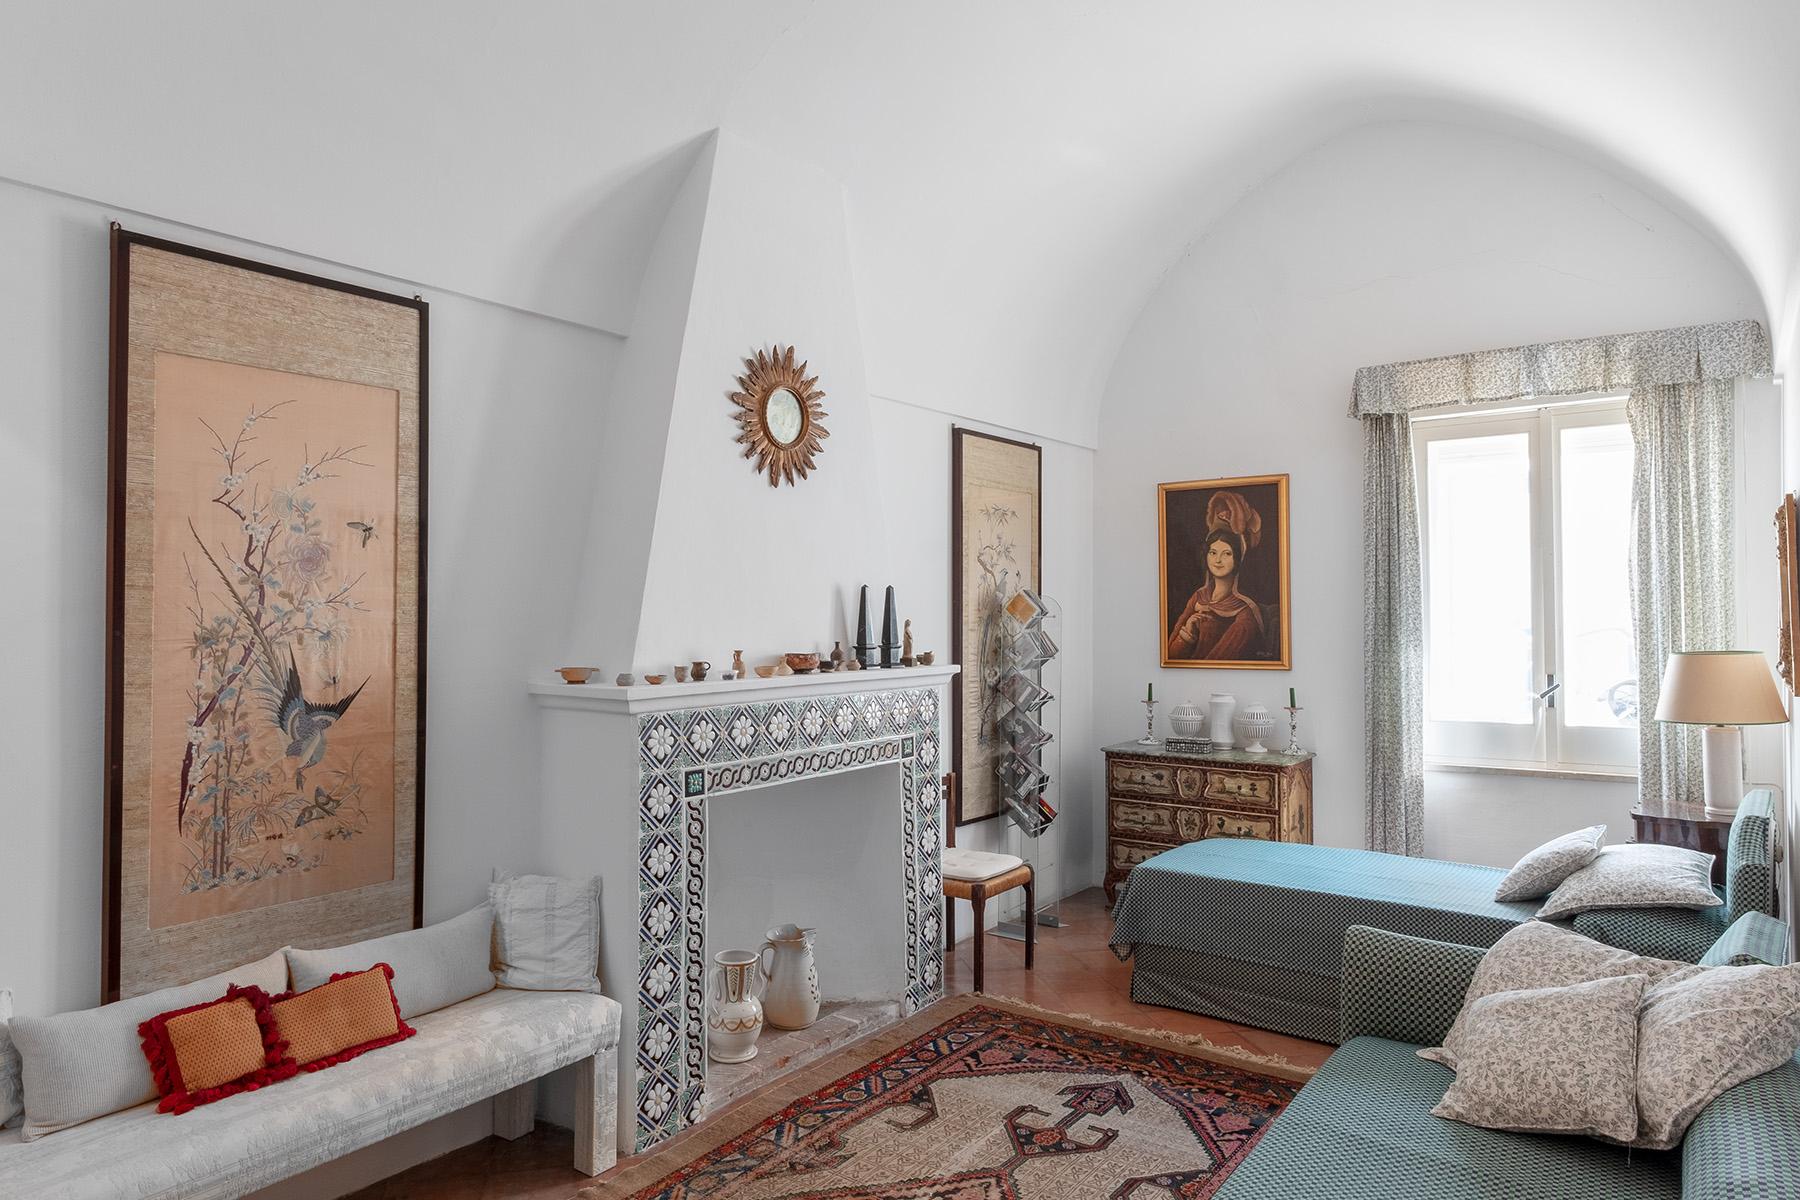 Casa indipendente in Vendita a Capri: 5 locali, 300 mq - Foto 19